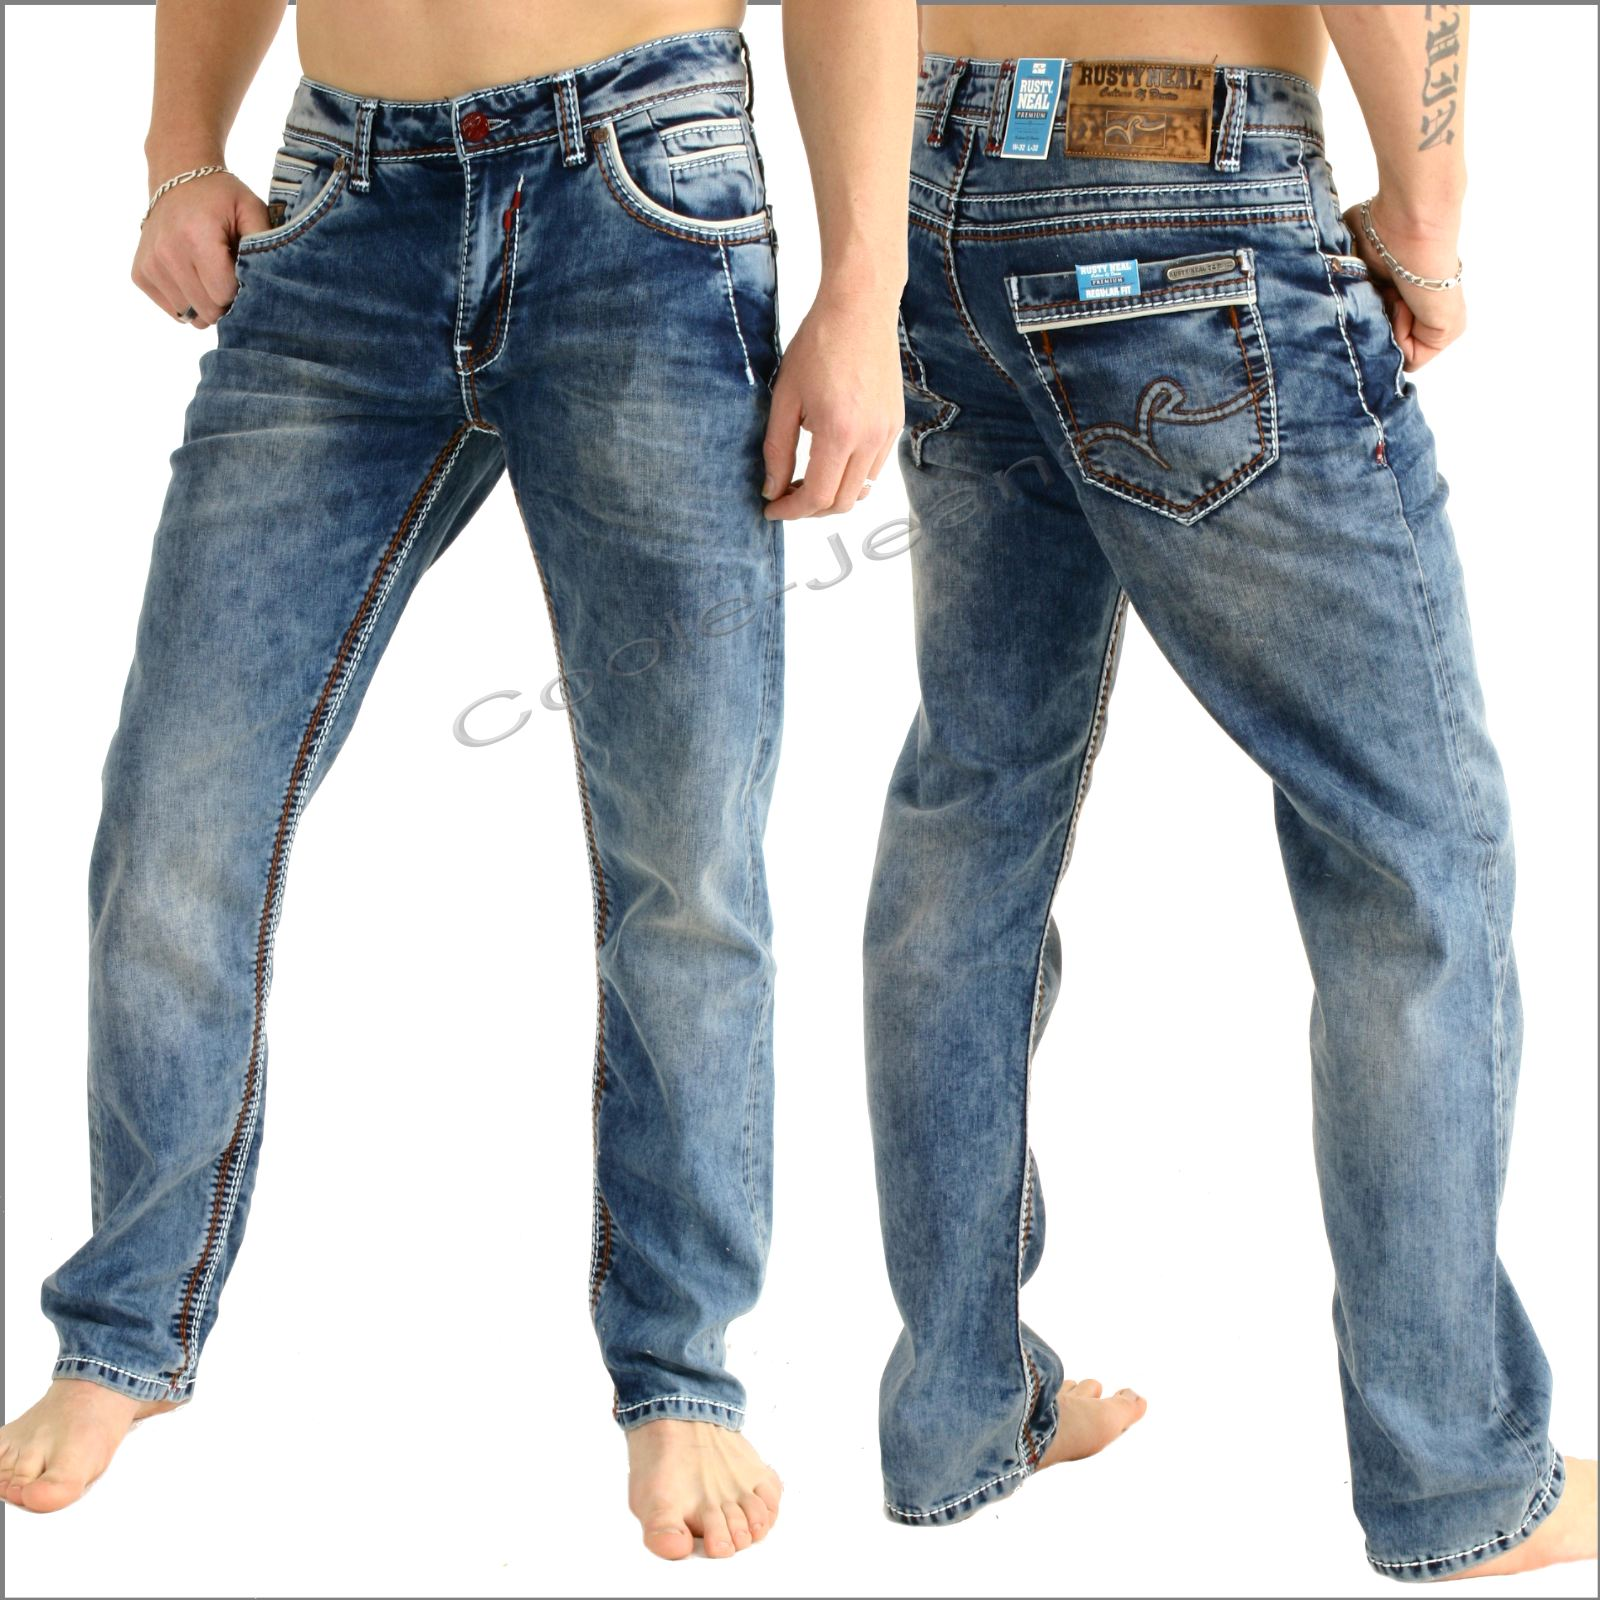 RustyNeal7650HerrenjeansRNealdarkblueweisseNaht  # Waschmaschine Jeans